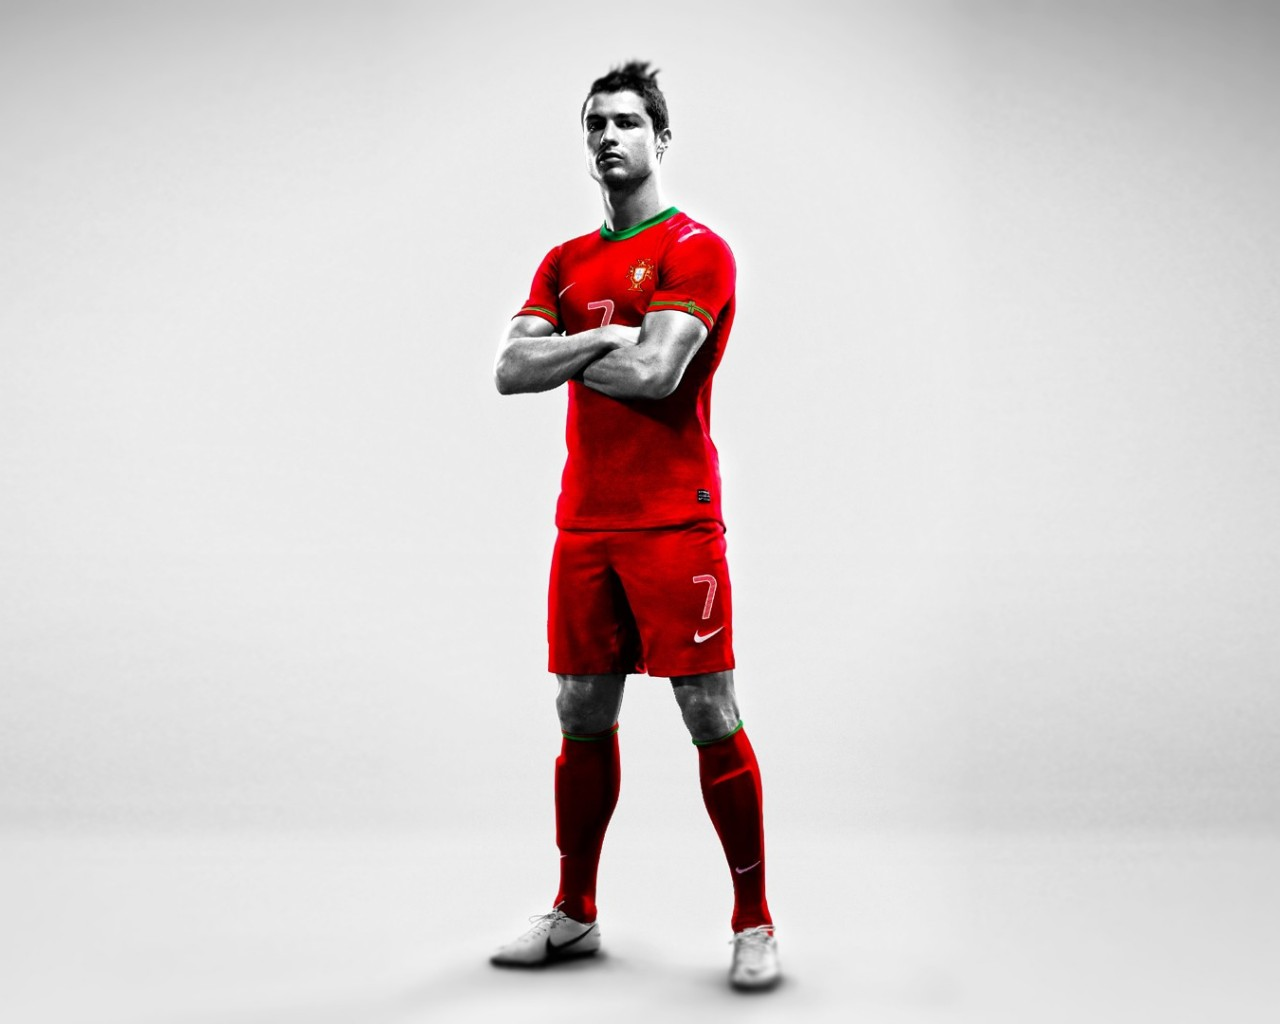 Cr7 Wallpaper Iphone X Cristiano Ronaldo Red Portugal Jersey Wallpaper